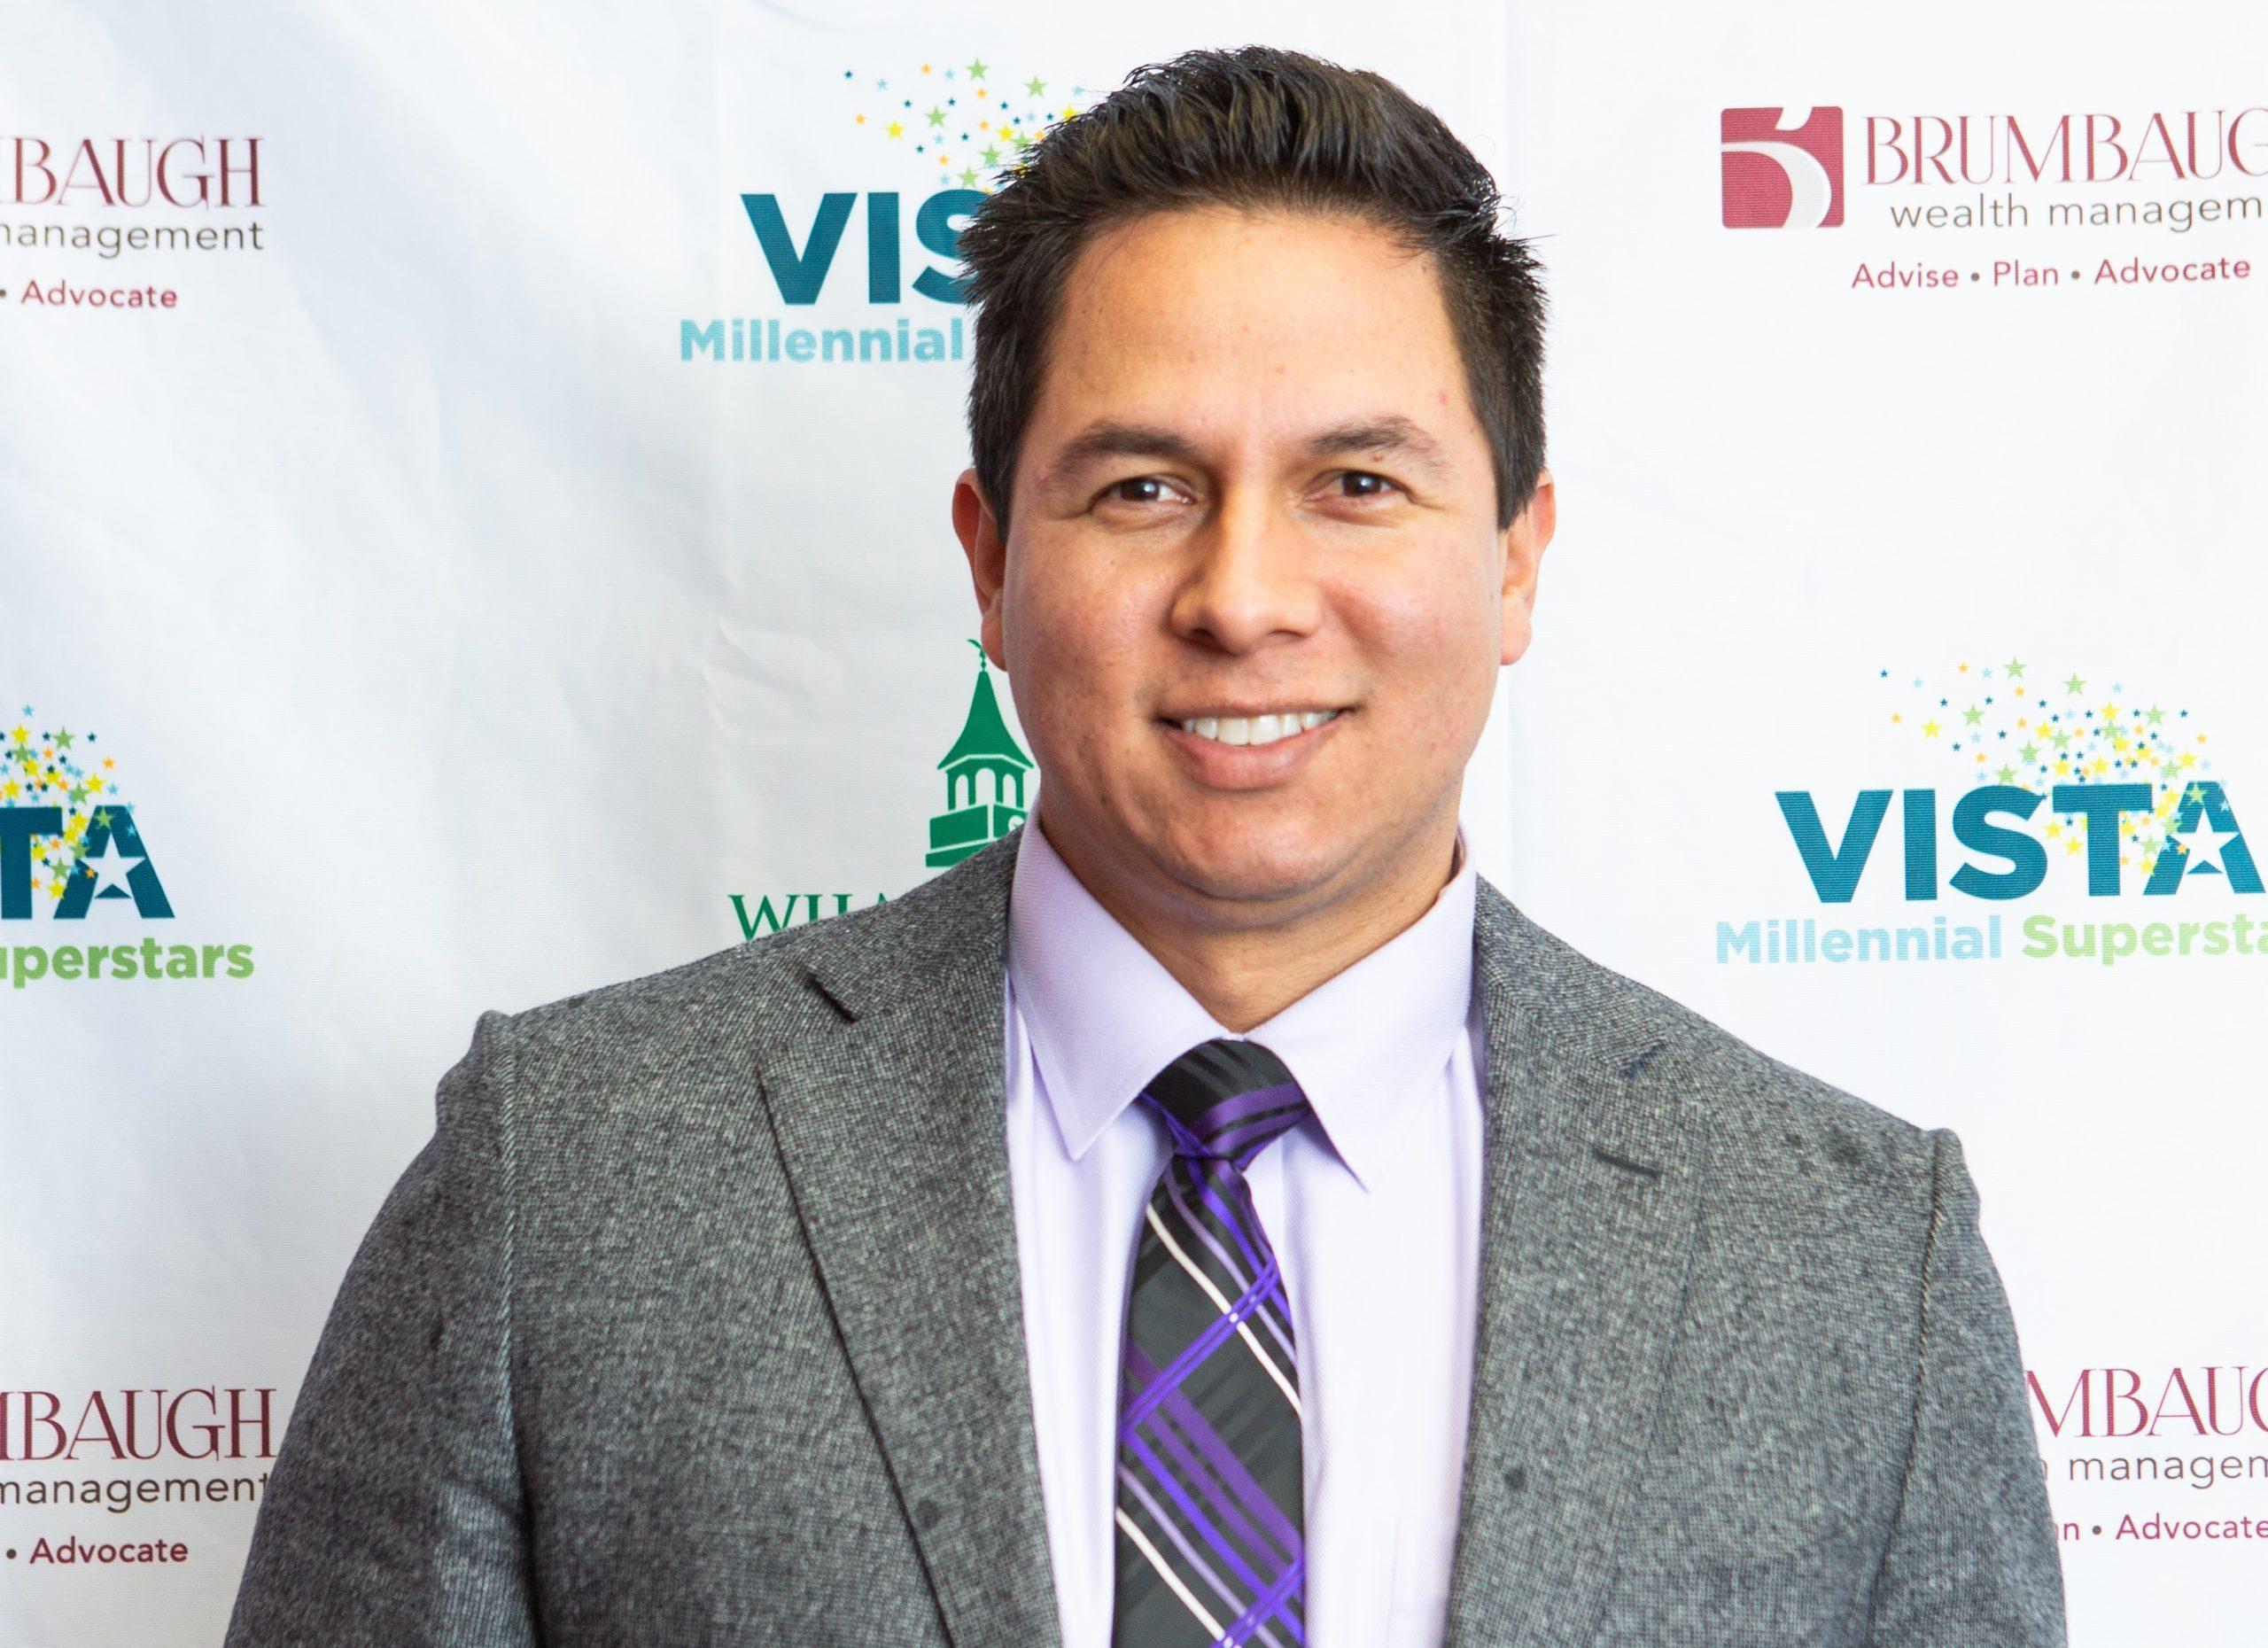 2020 VISTA Millennial Superstars: Miguel Alban